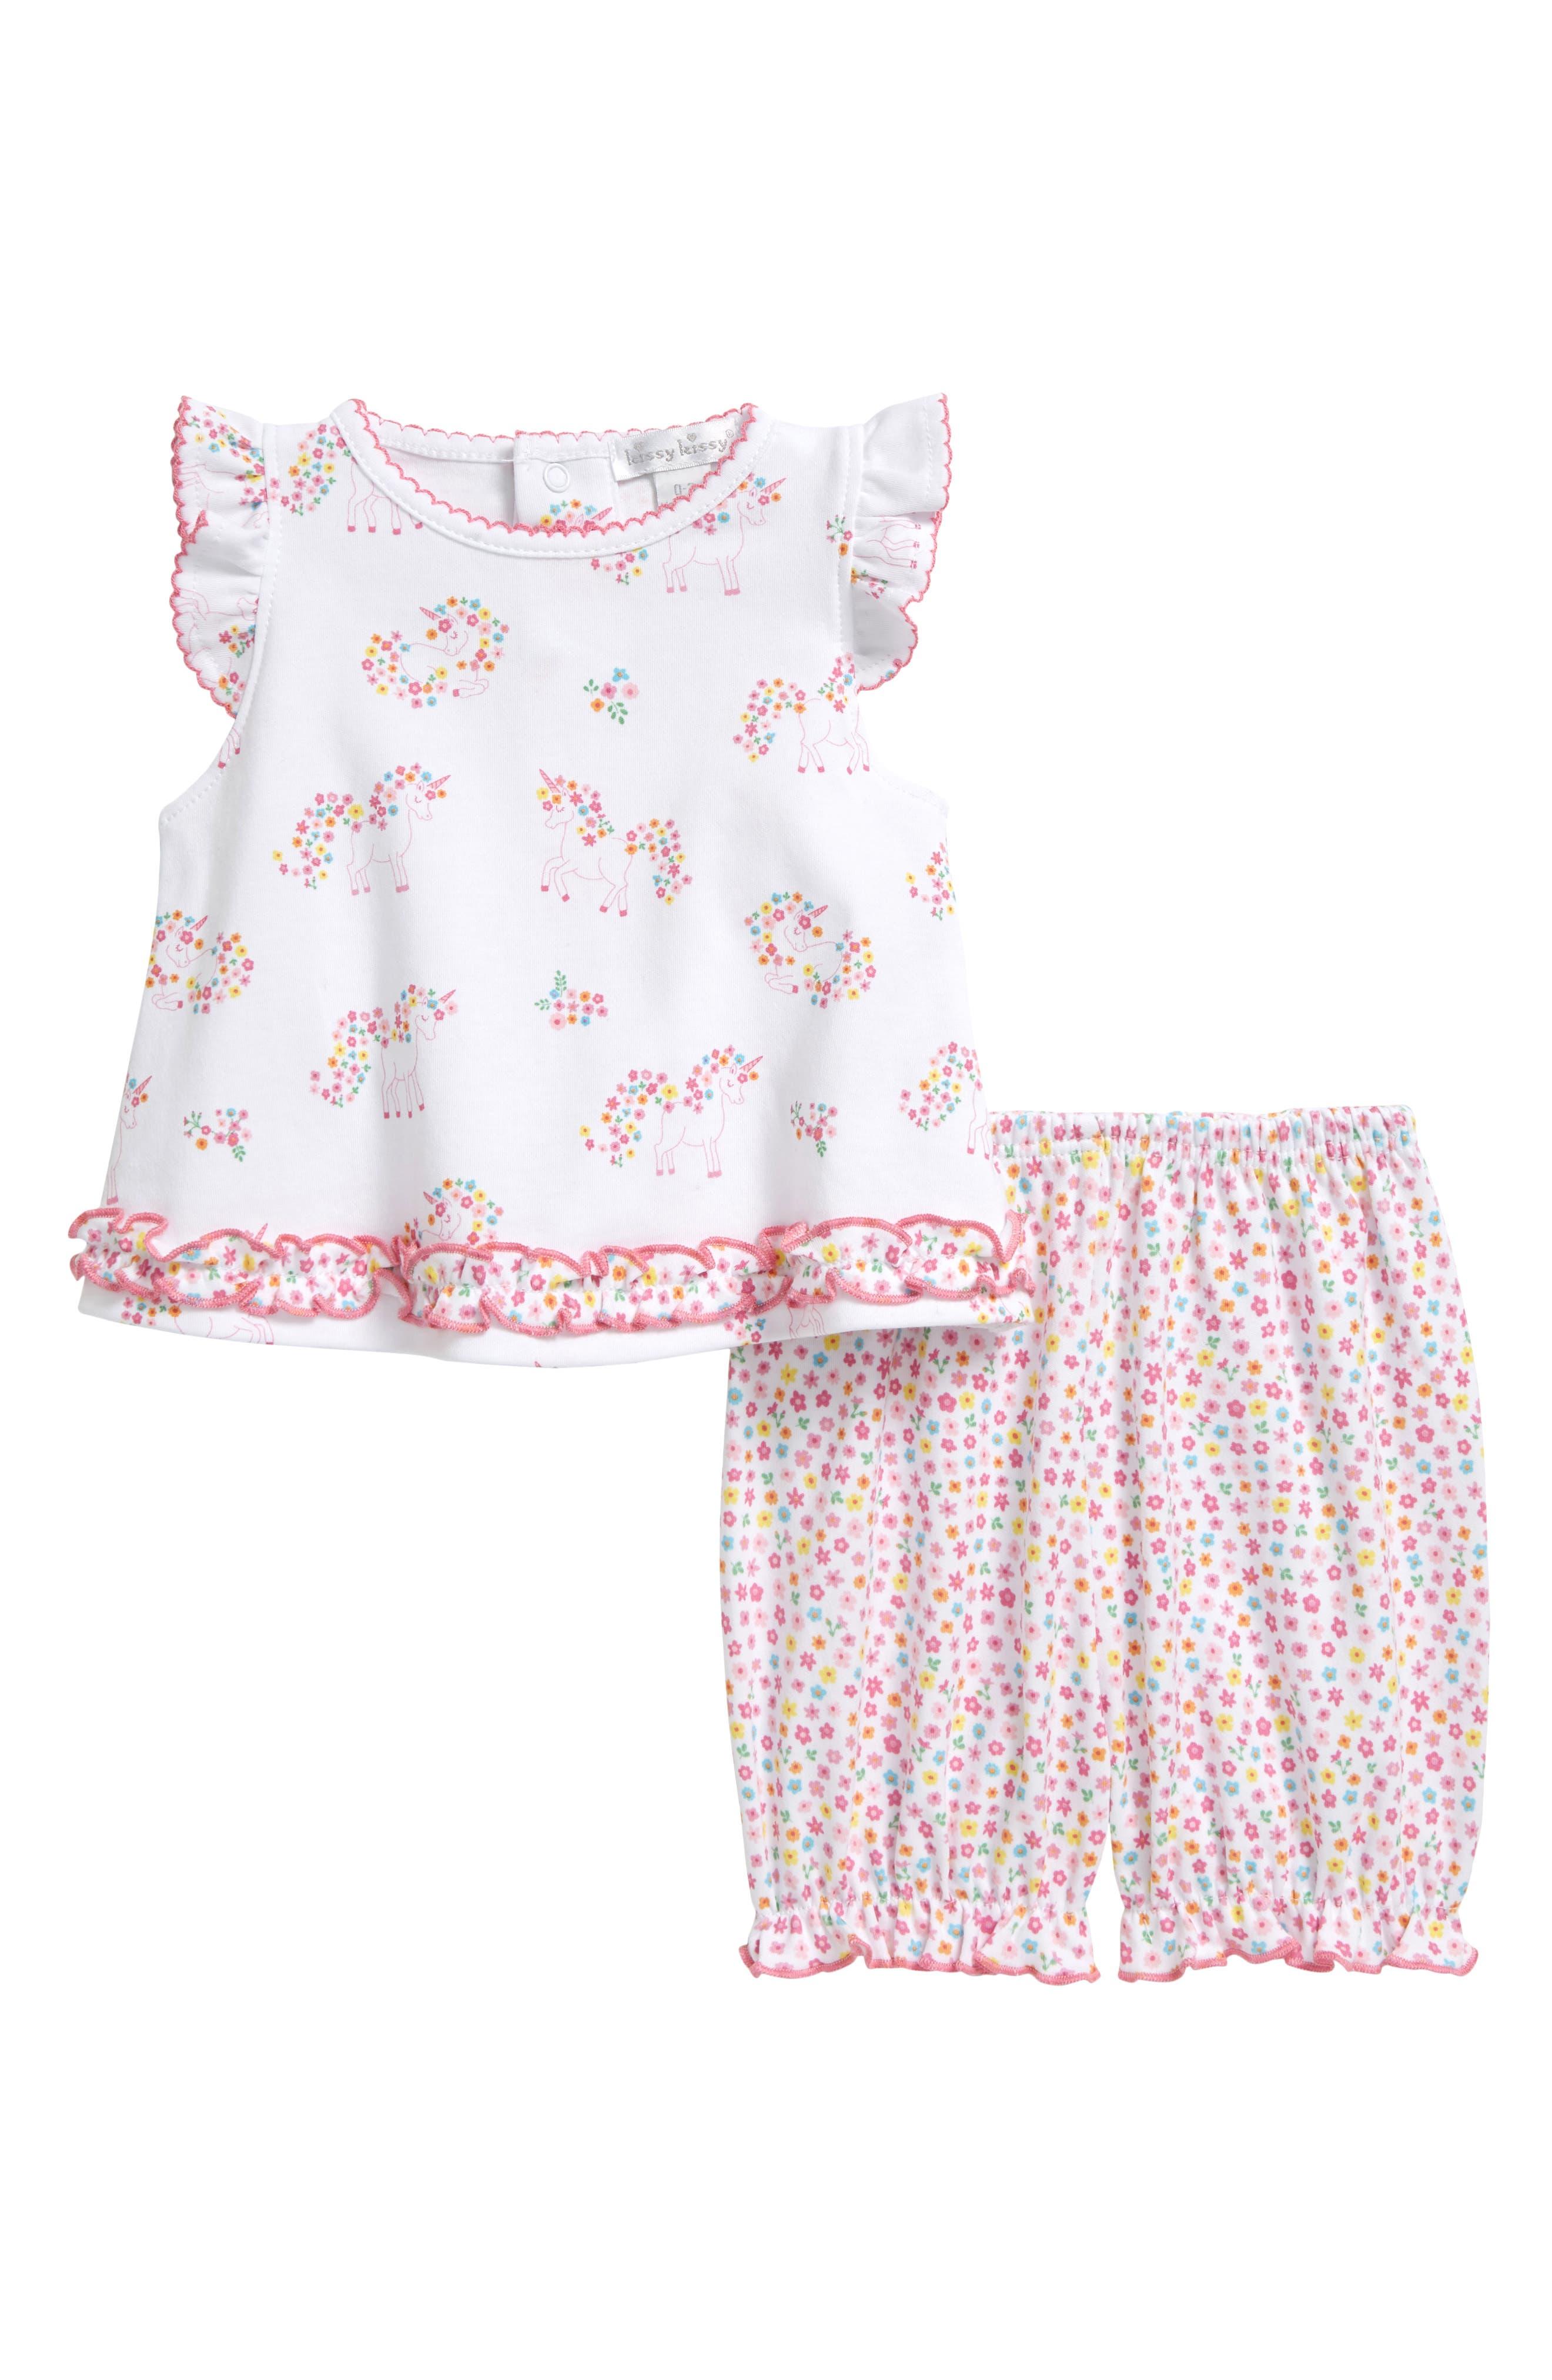 Kissy Kissy Infant Girl's Kissy Kissy Unicorn Gardens Top & Pants Set